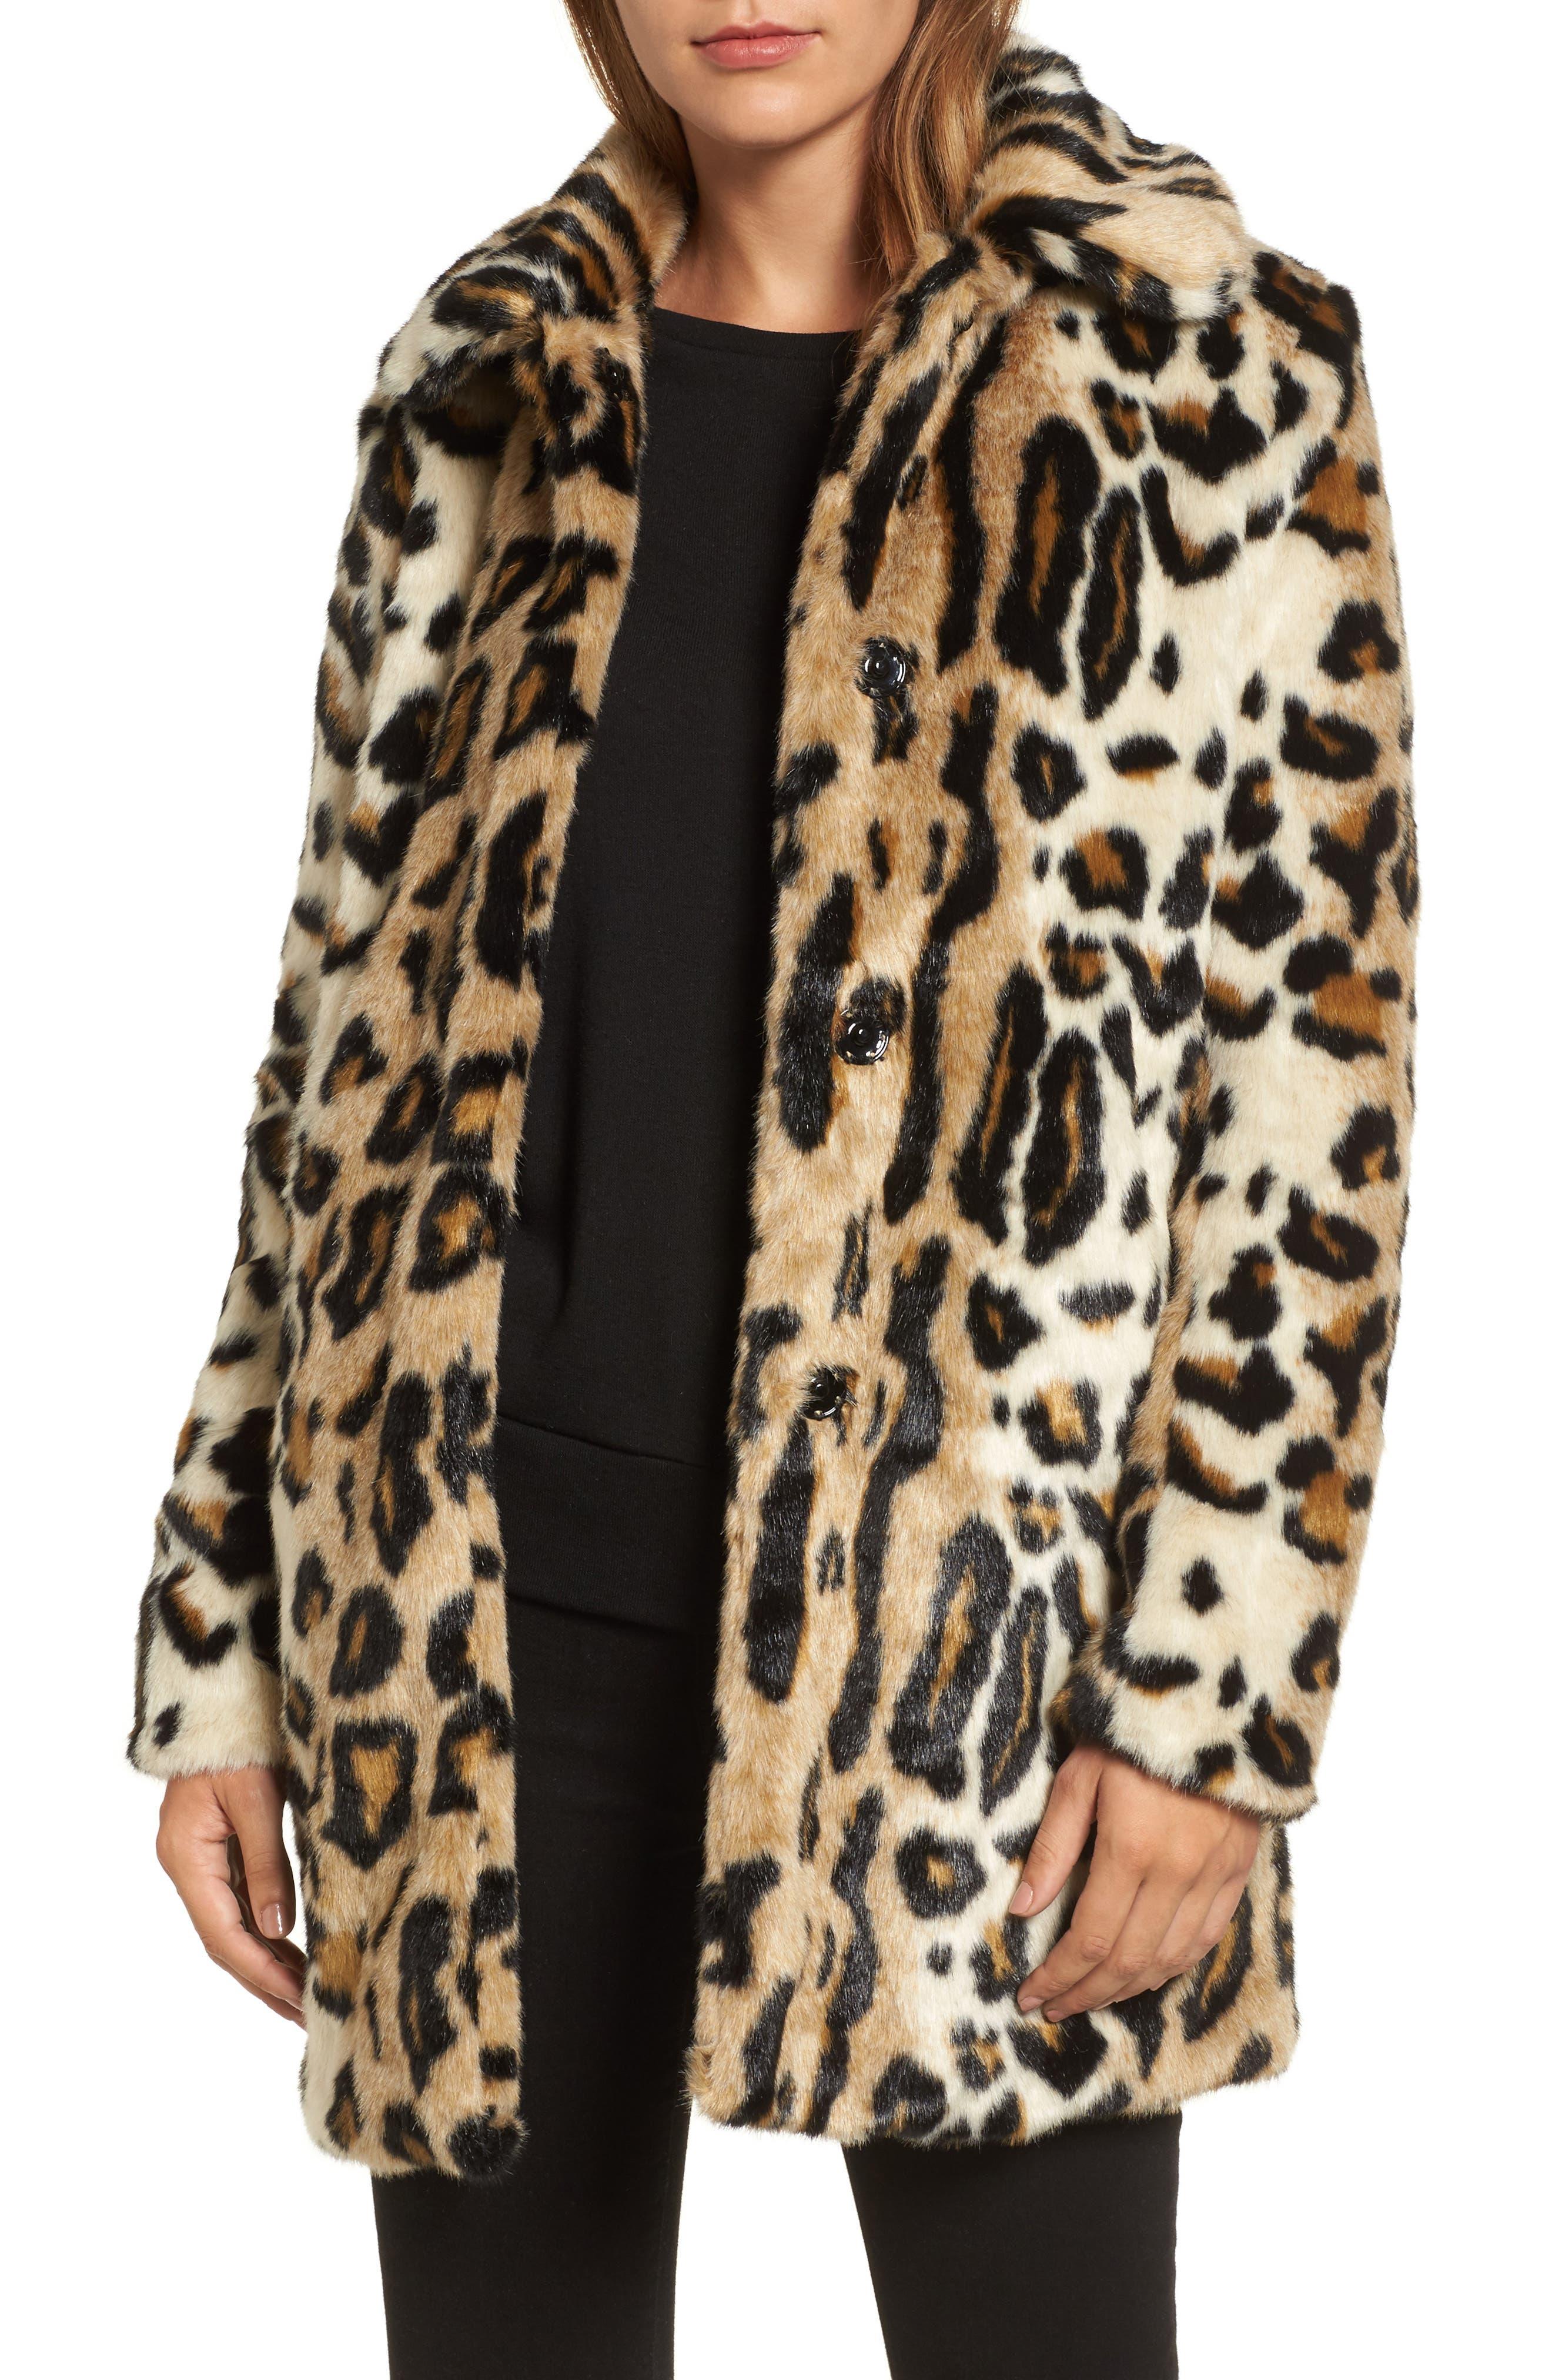 Kensie Leopard Spot Reversible Faux Fur Coat